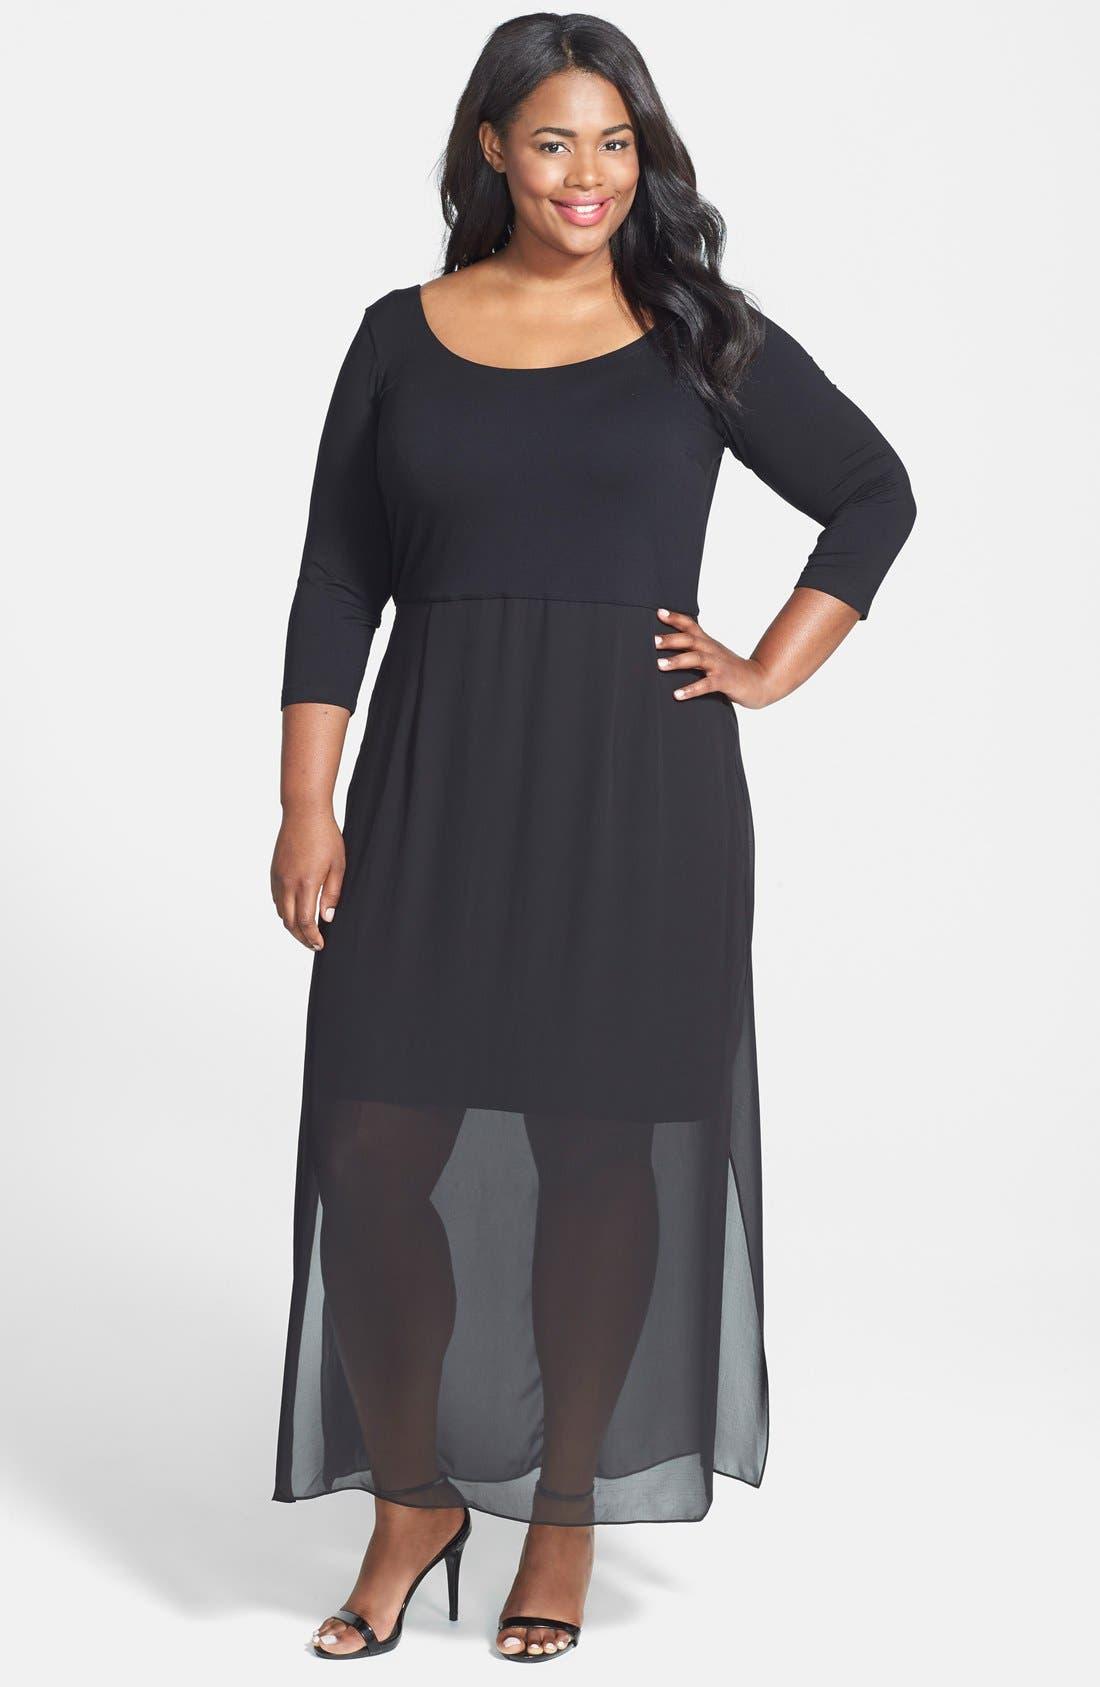 Alternate Image 1 Selected - Vince Camuto Chiffon Overlay Maxi Dress (Plus Size)